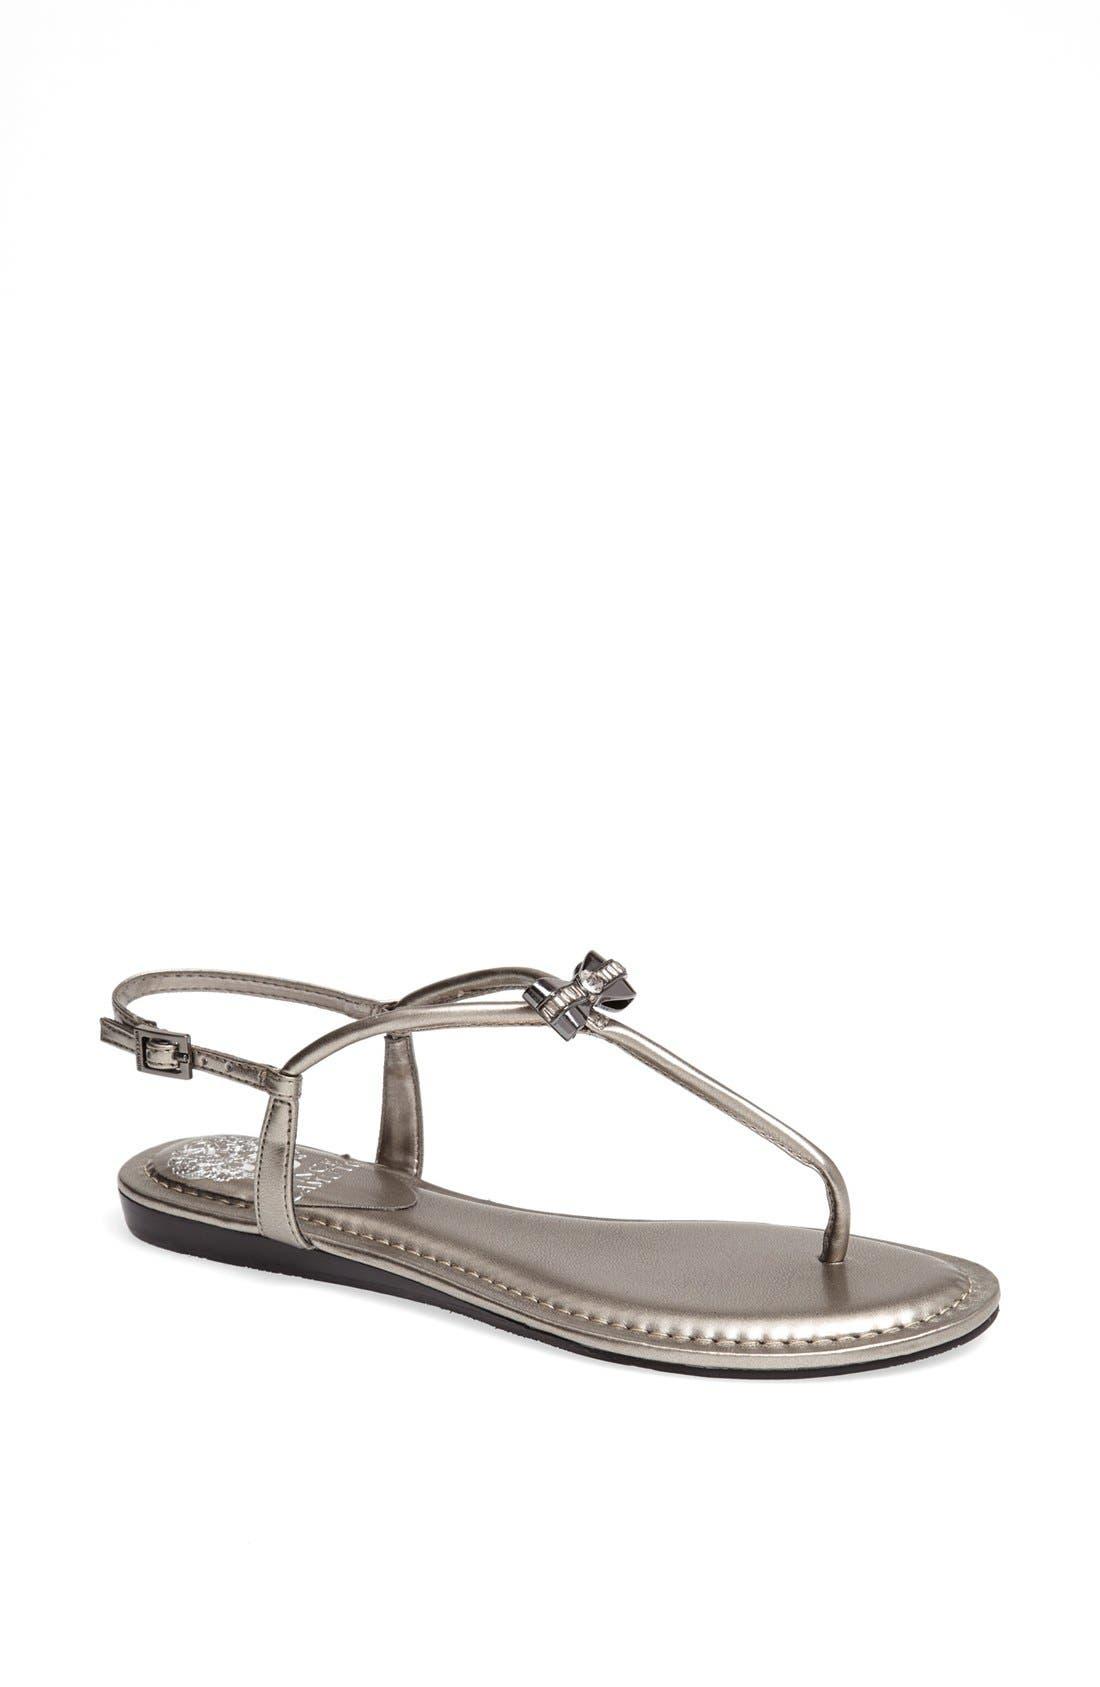 Alternate Image 1 Selected - Vince Camuto 'Klaudio' Thong Sandal